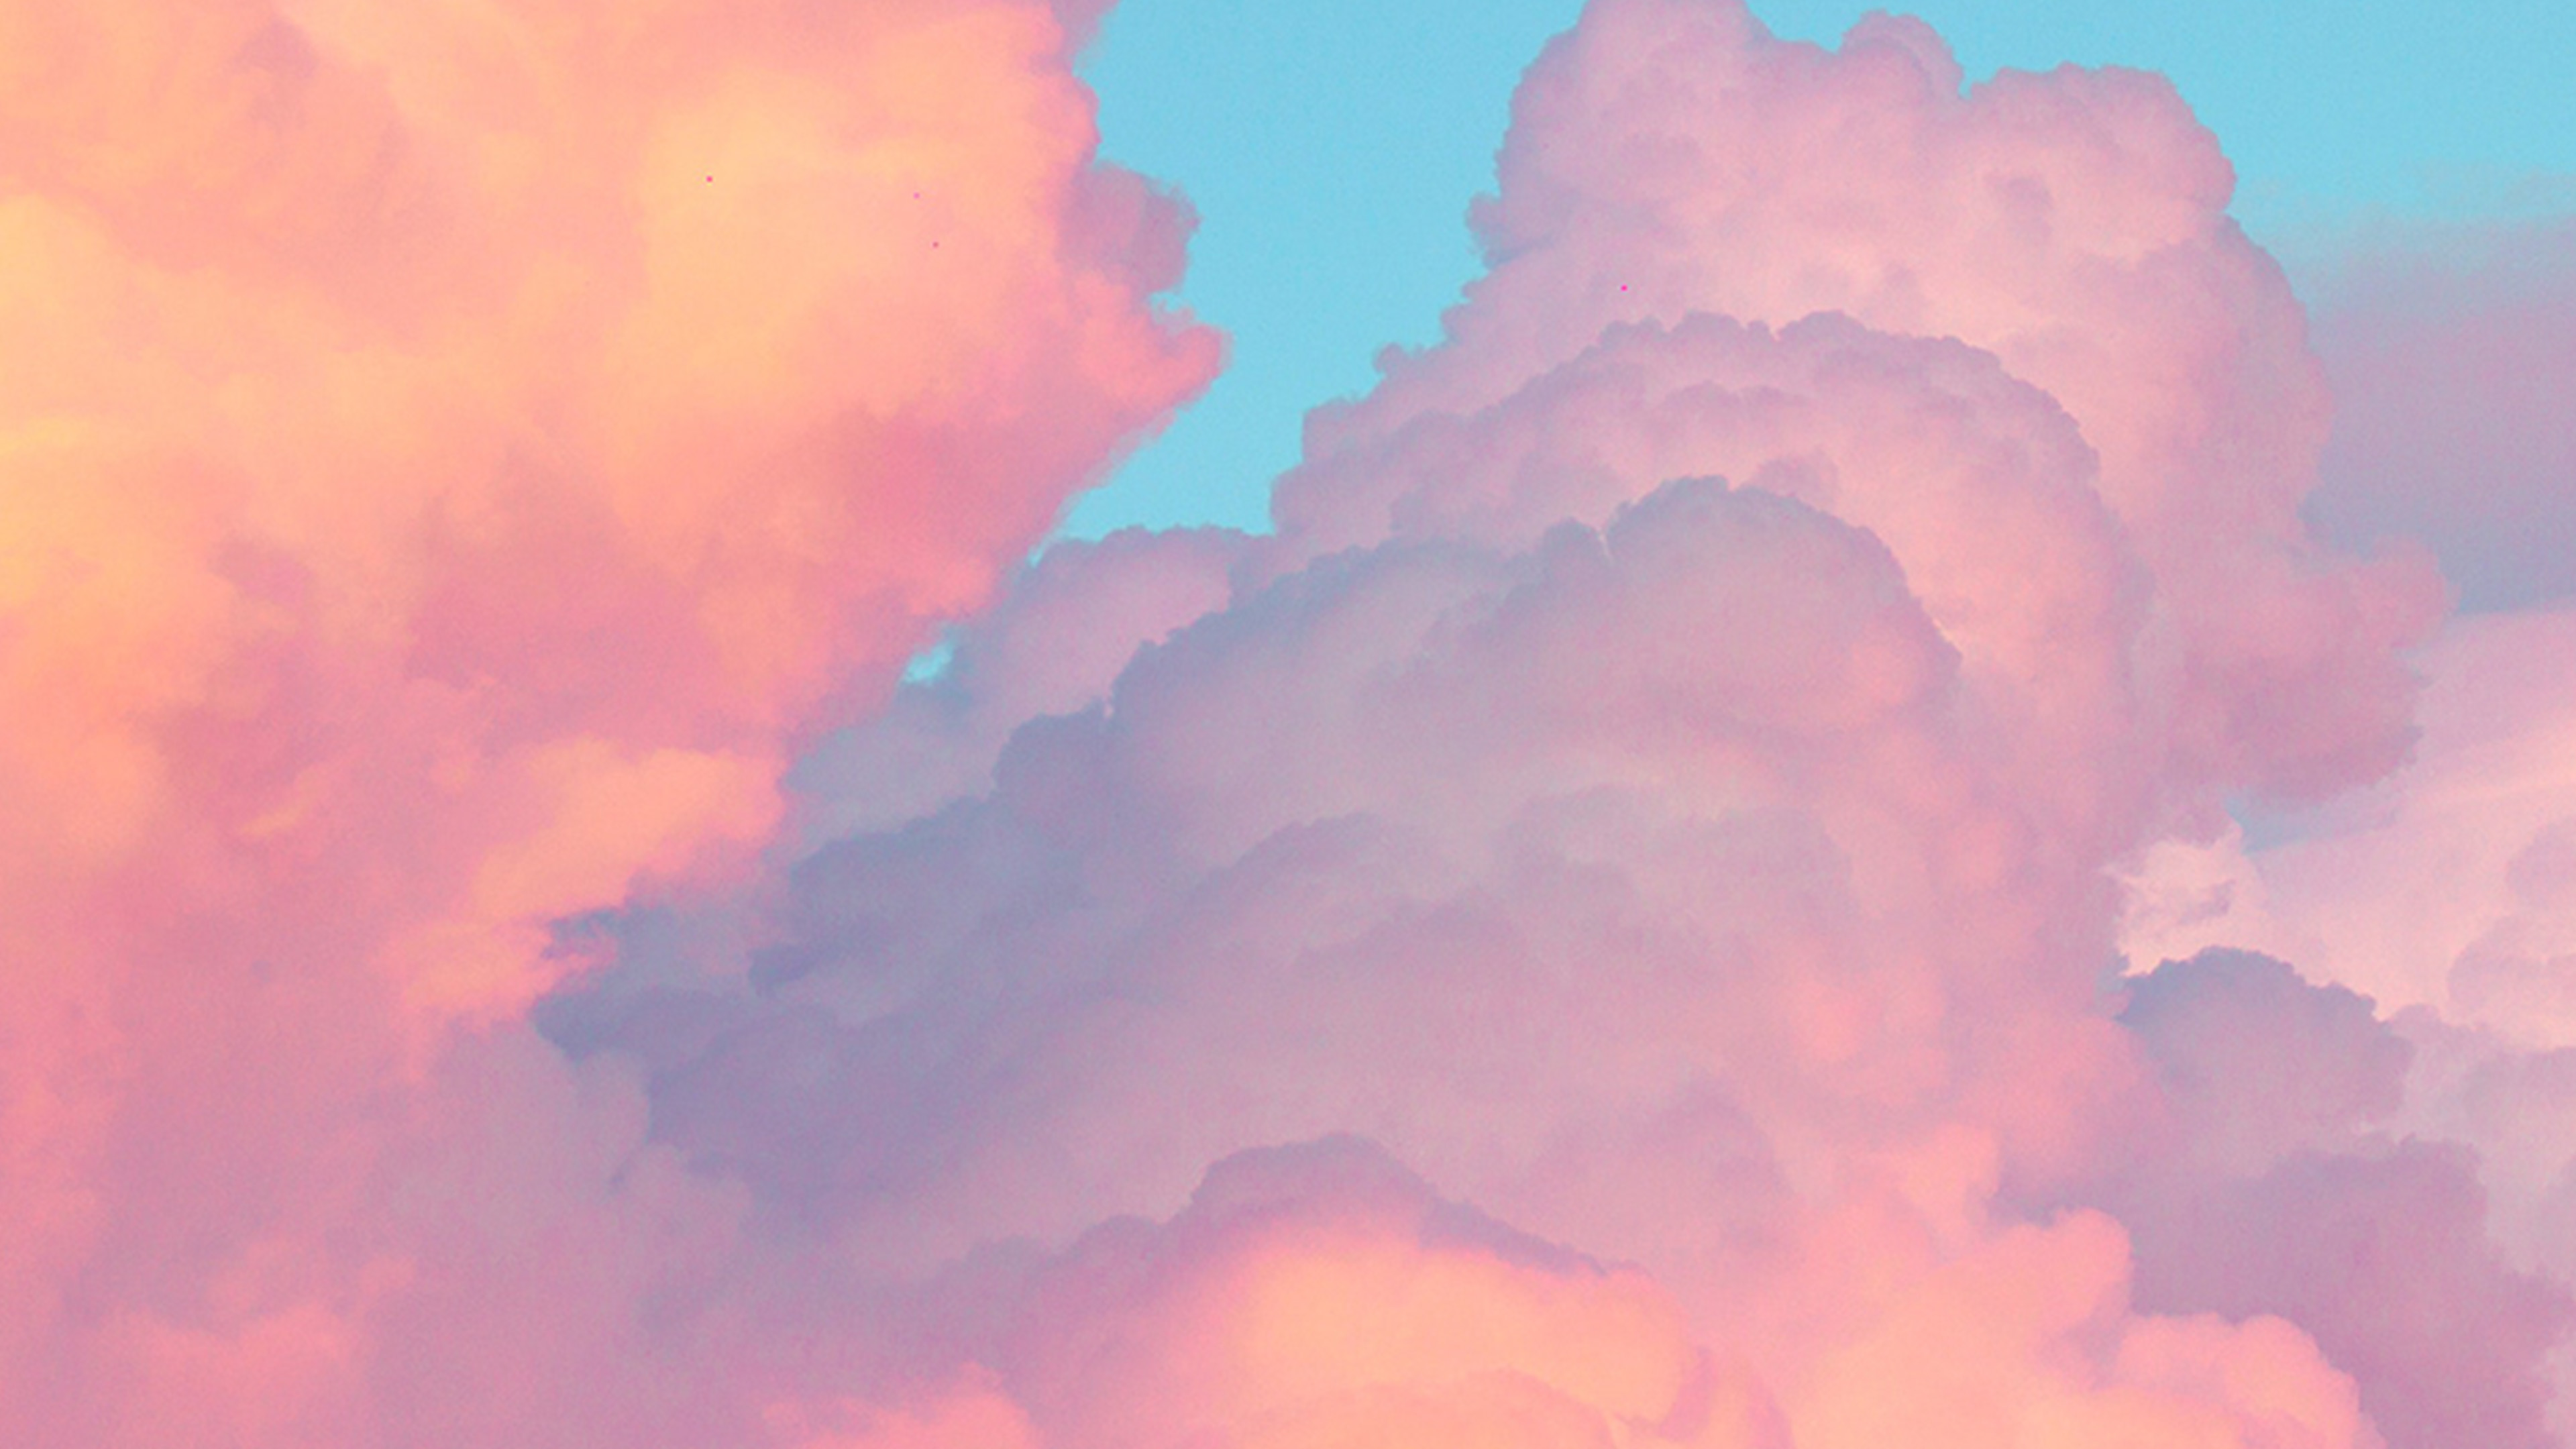 Pop Art Wallpaper Iphone Wallpaper For Desktop Laptop Bf68 Cloud Metamorphosis